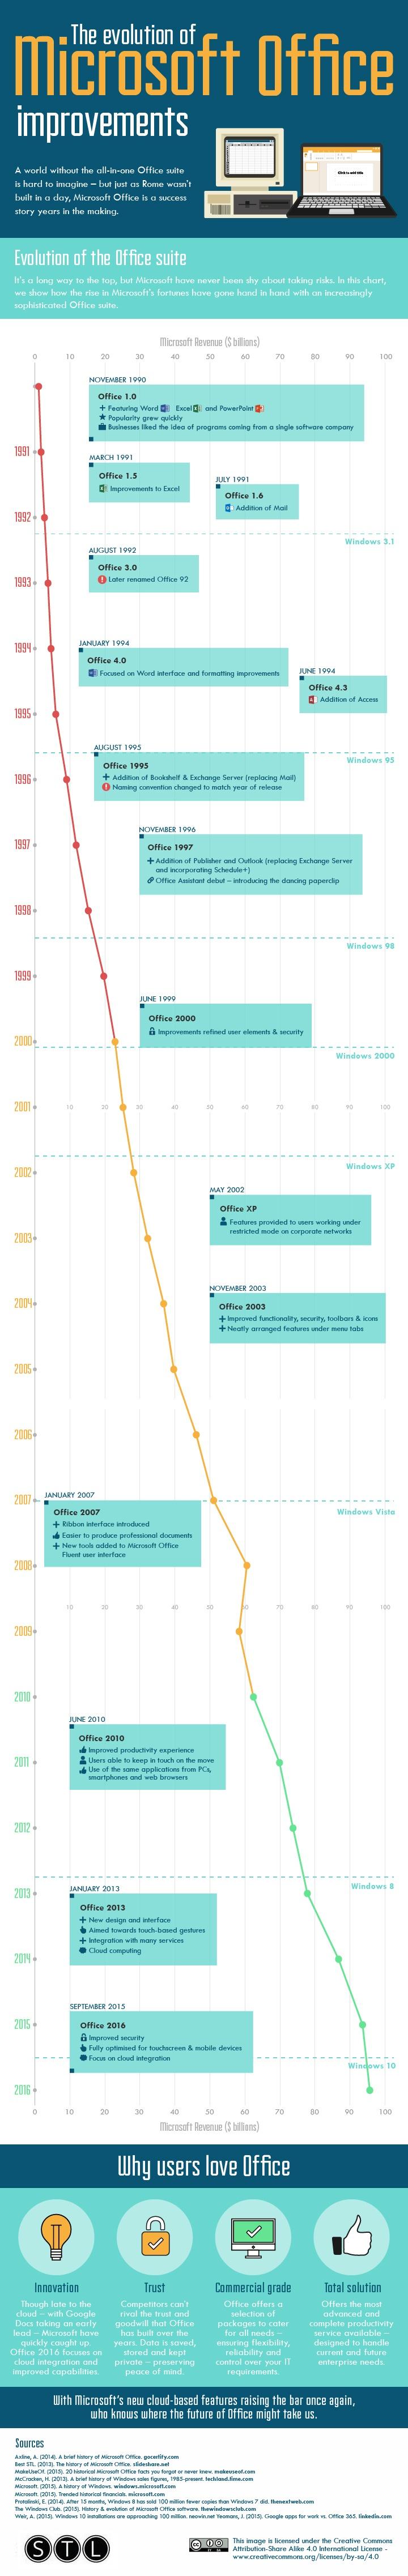 the-evolution-of-microsoft-office-improvements